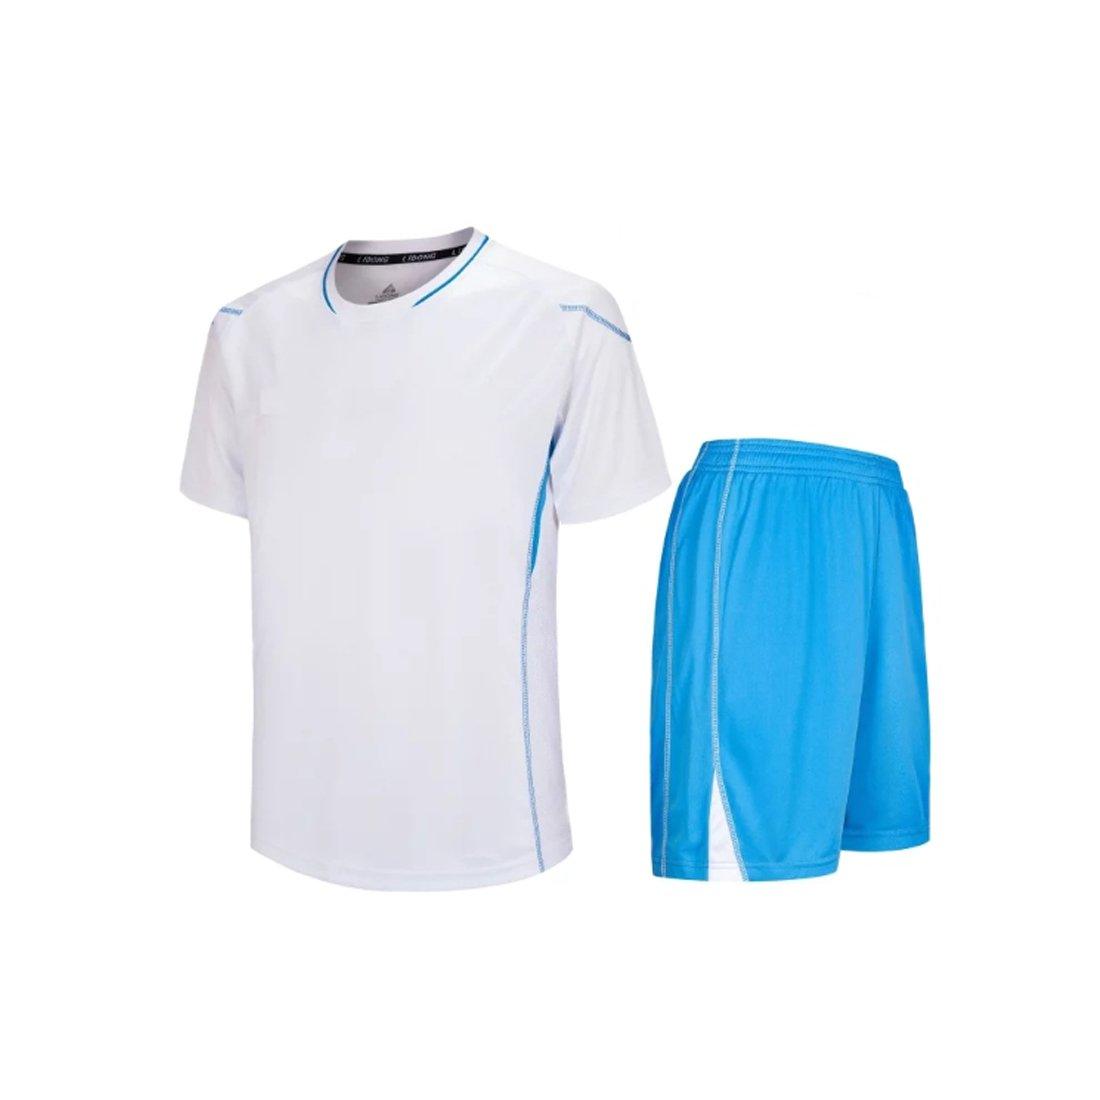 Inlefen Kurzarm Sport Shirt M/änner Schnell Trocknend Jungen Laufen T-Shirts Gym Kleidung Mens Fu/ßball Jerse Set